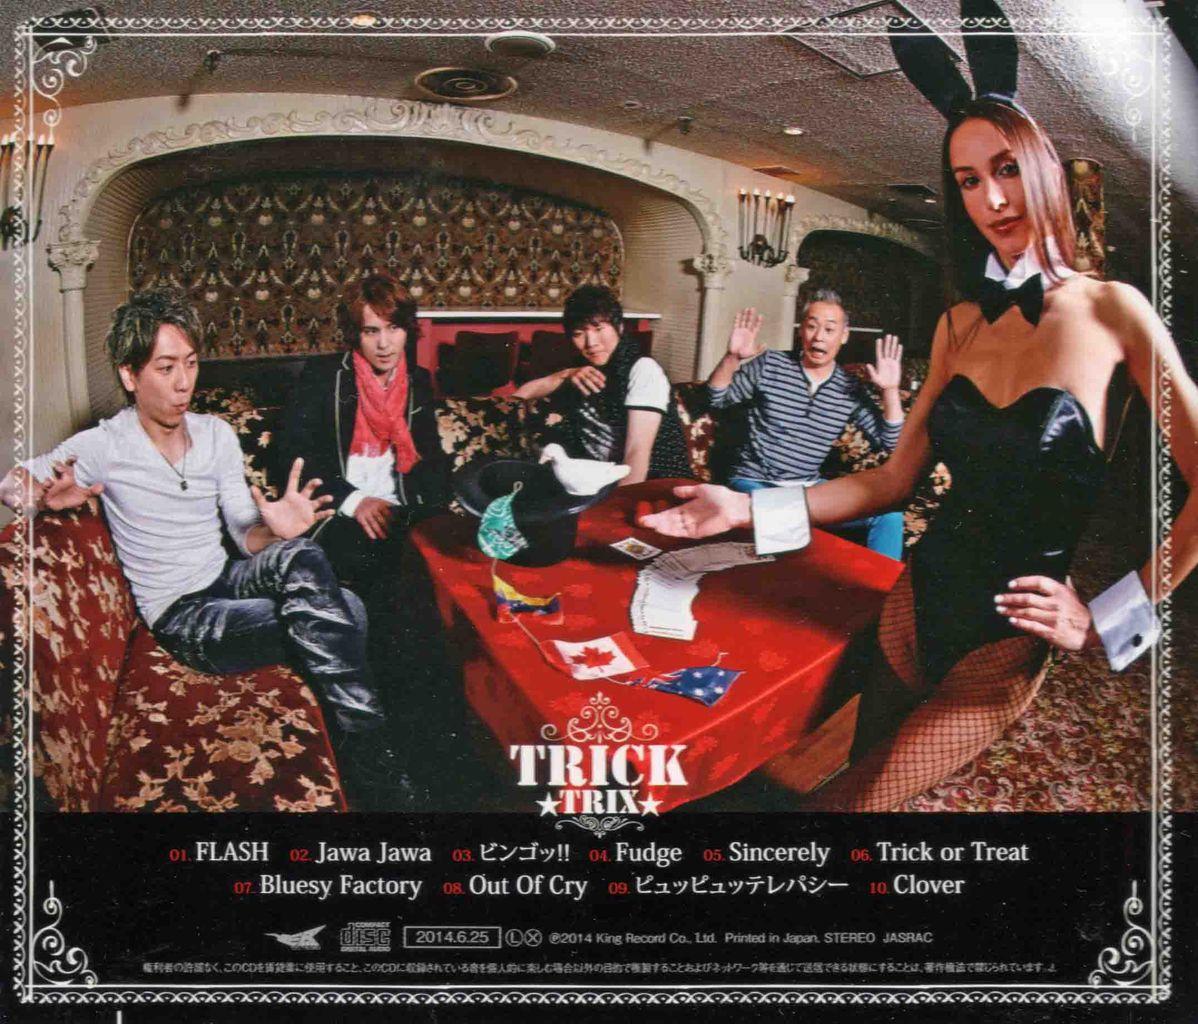 TRICK-2